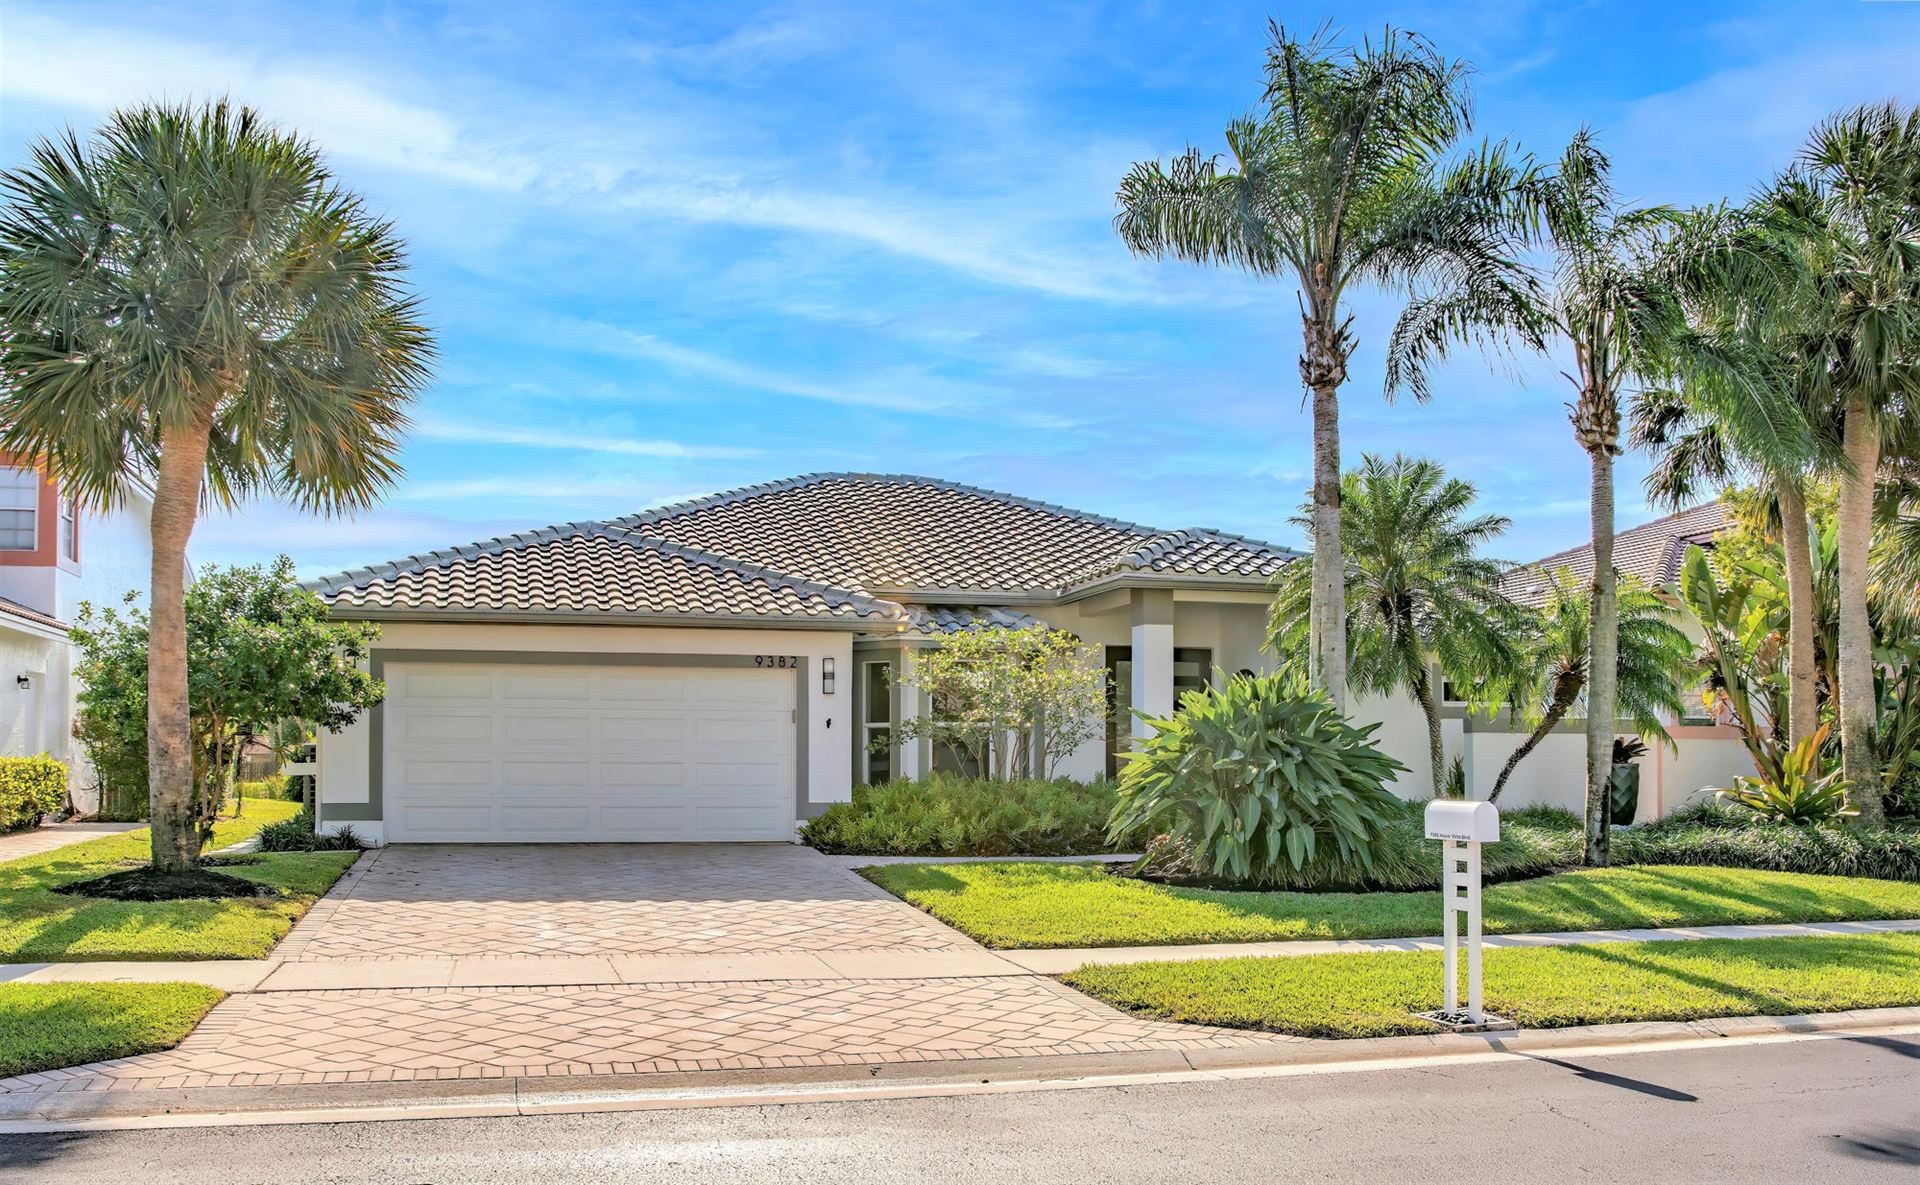 9382 Aqua Vista Boulevard, Boynton Beach, FL 33437 - MLS#: RX-10709470